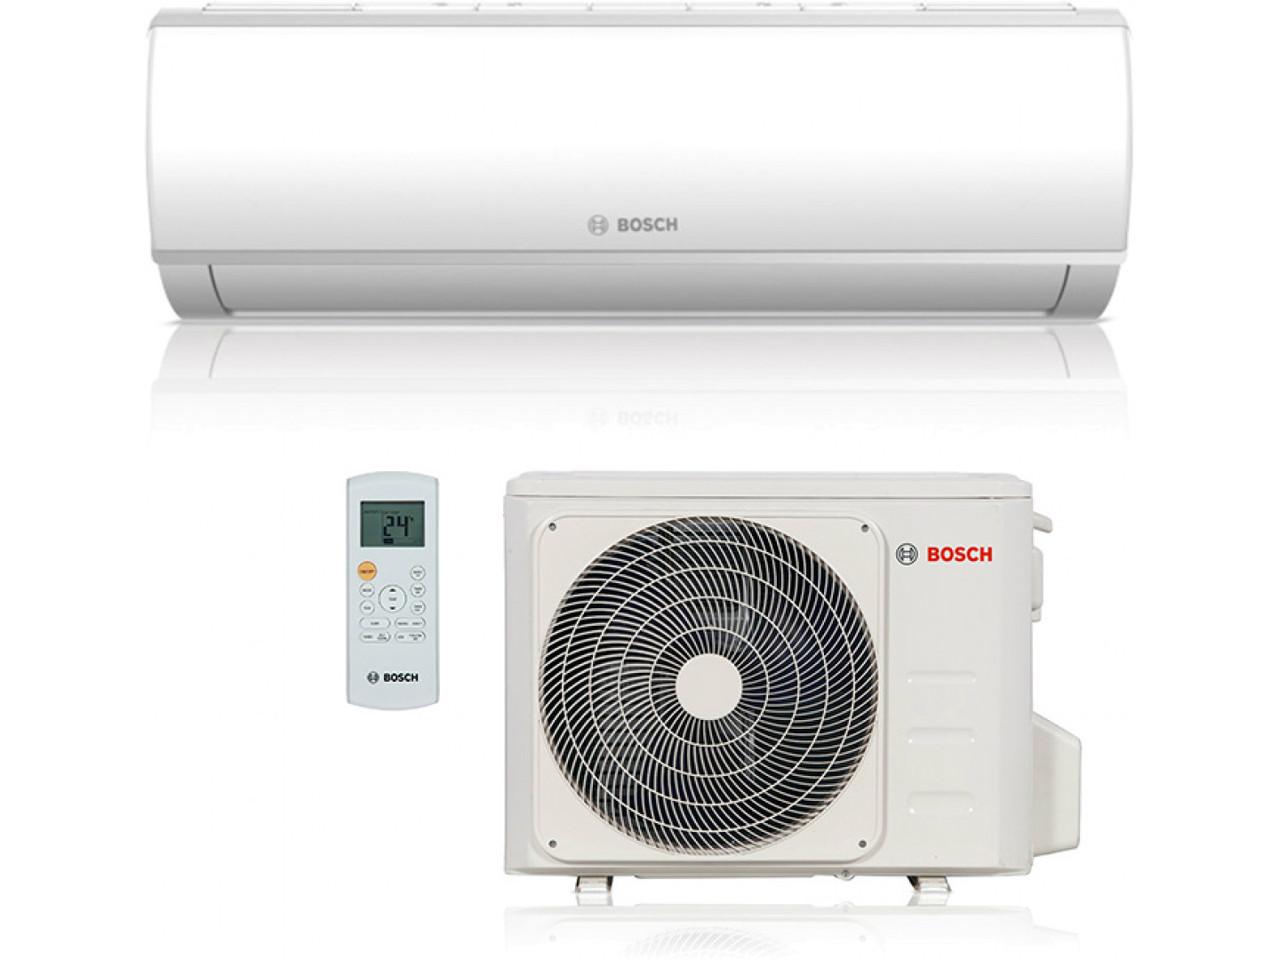 Настінні спліт - системи Bosch Climate 5000 RAC 3,5-2 IBW / Climate RAC 3,5-2 OU